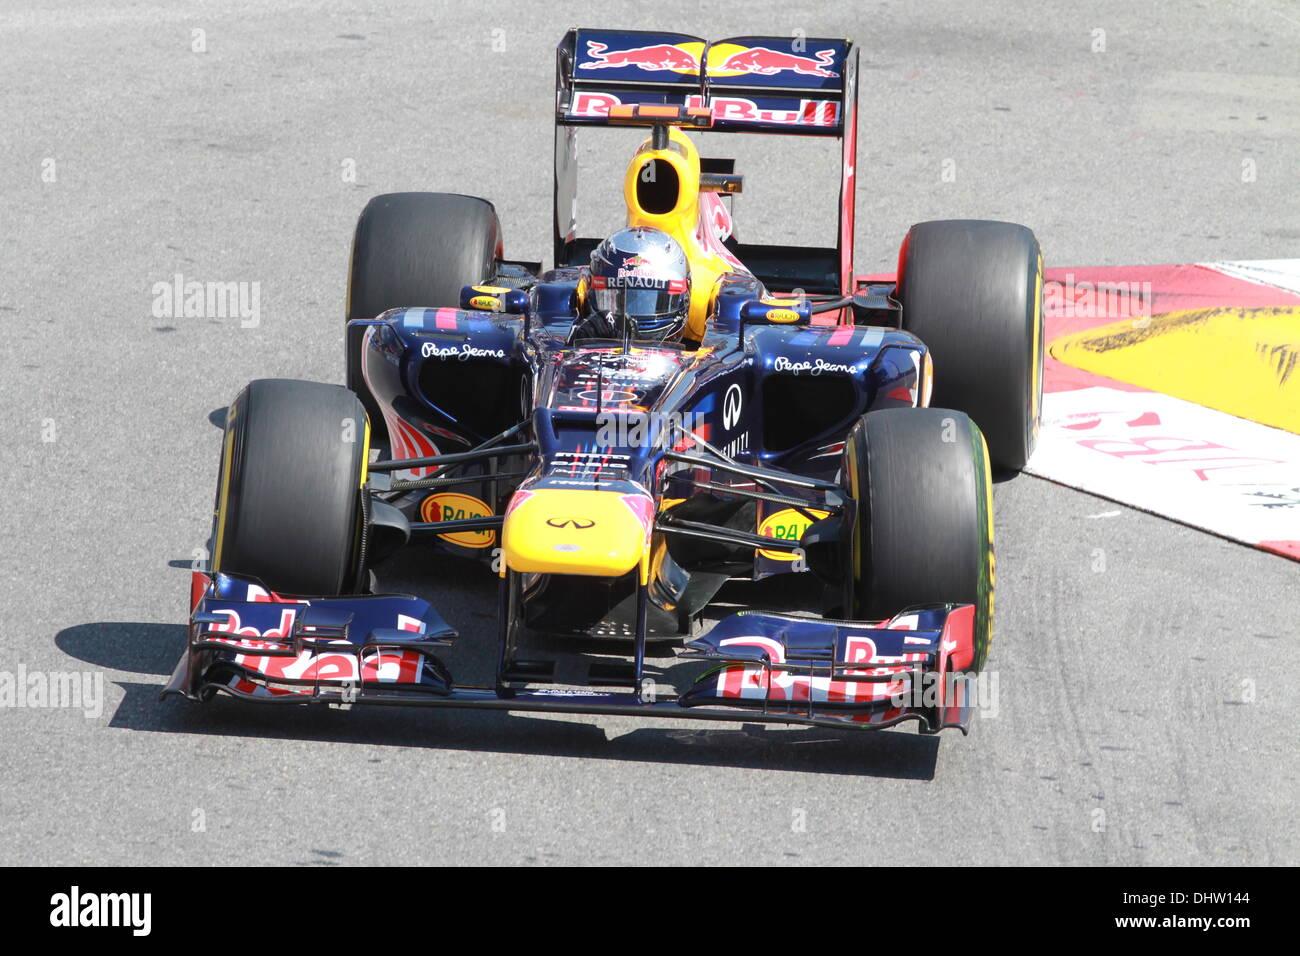 Sebastian VETTEL Germany D Red Bull Racing Renault F1